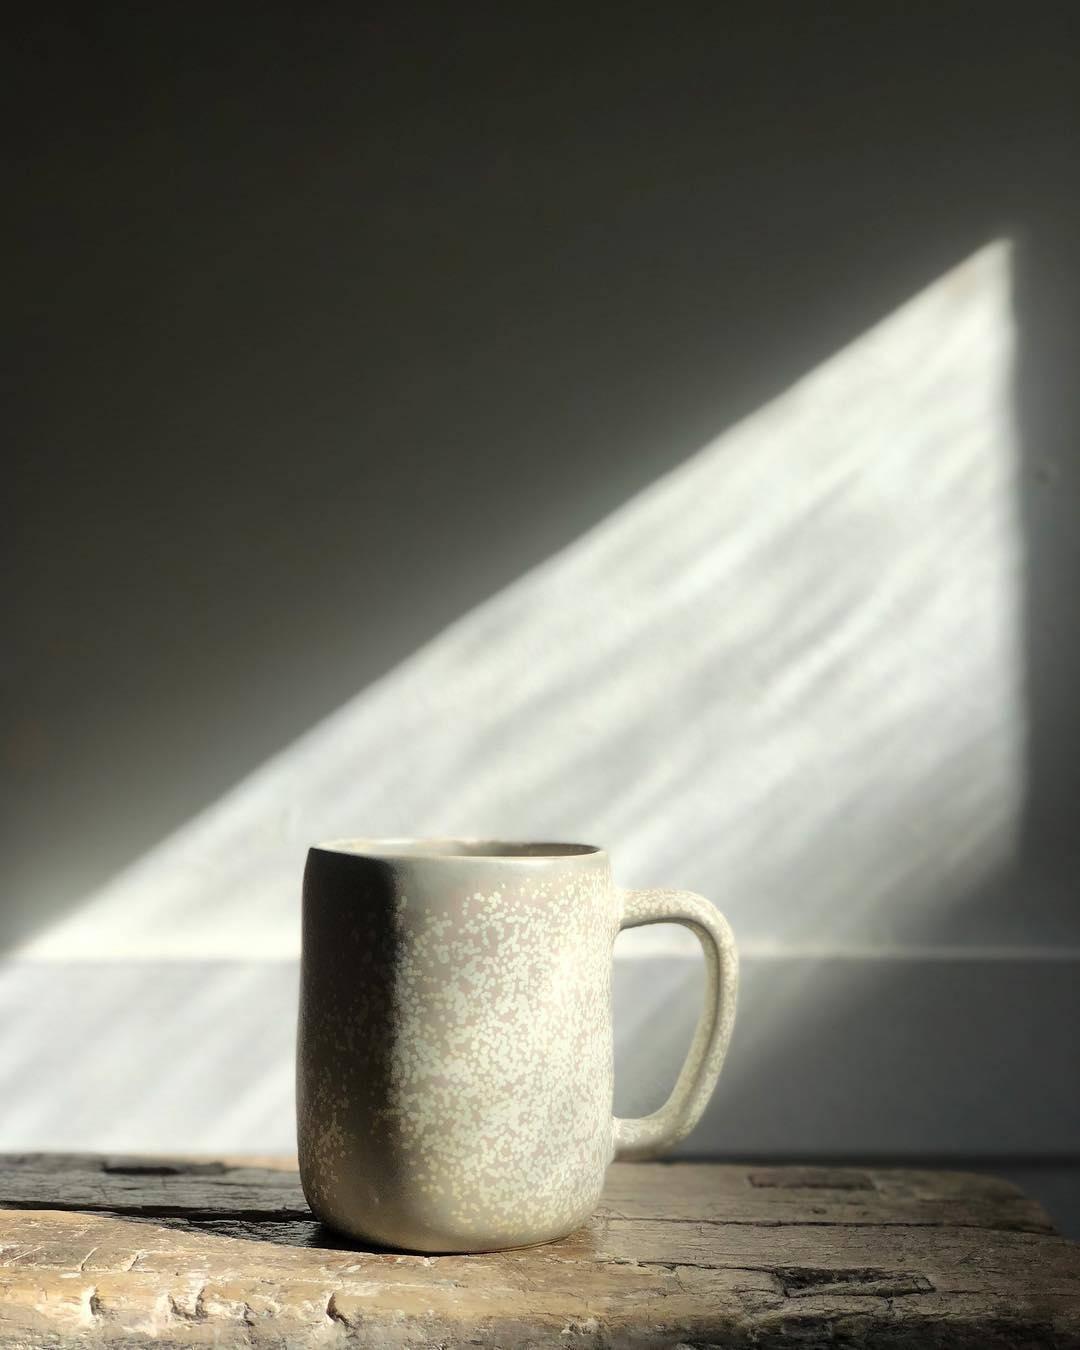 12 oz. Luvhaus Moon Mug